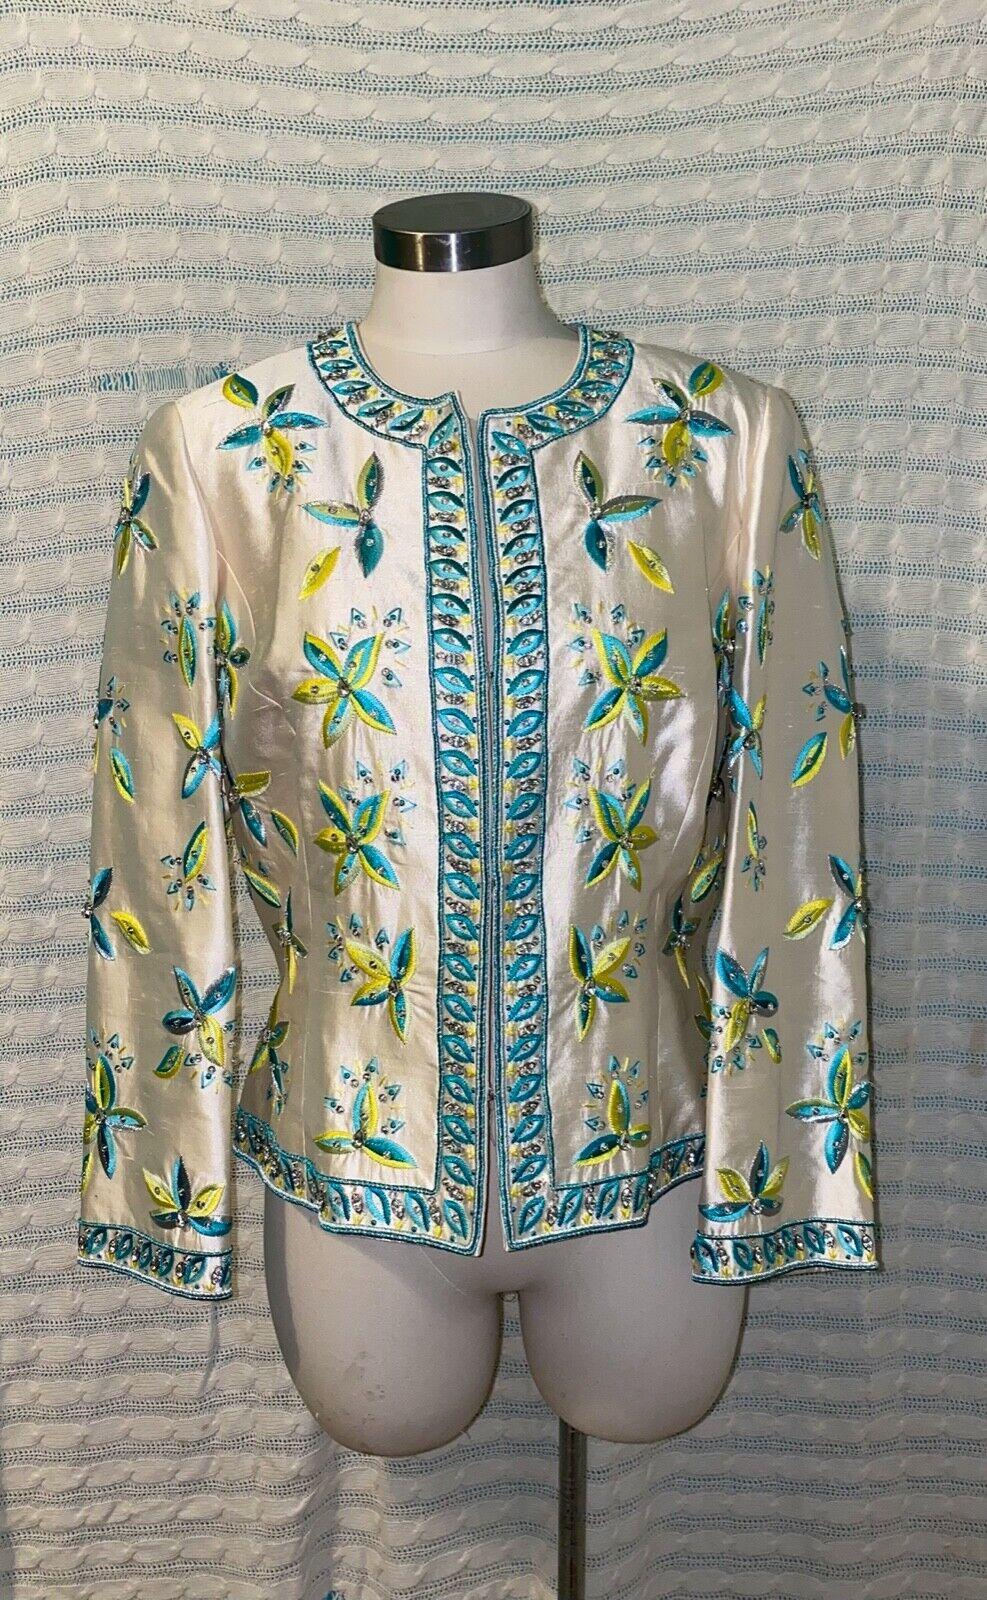 Etcetera Mother Of The Bride Wedding Jacket Ivory Teal 100% Silk Sz 12